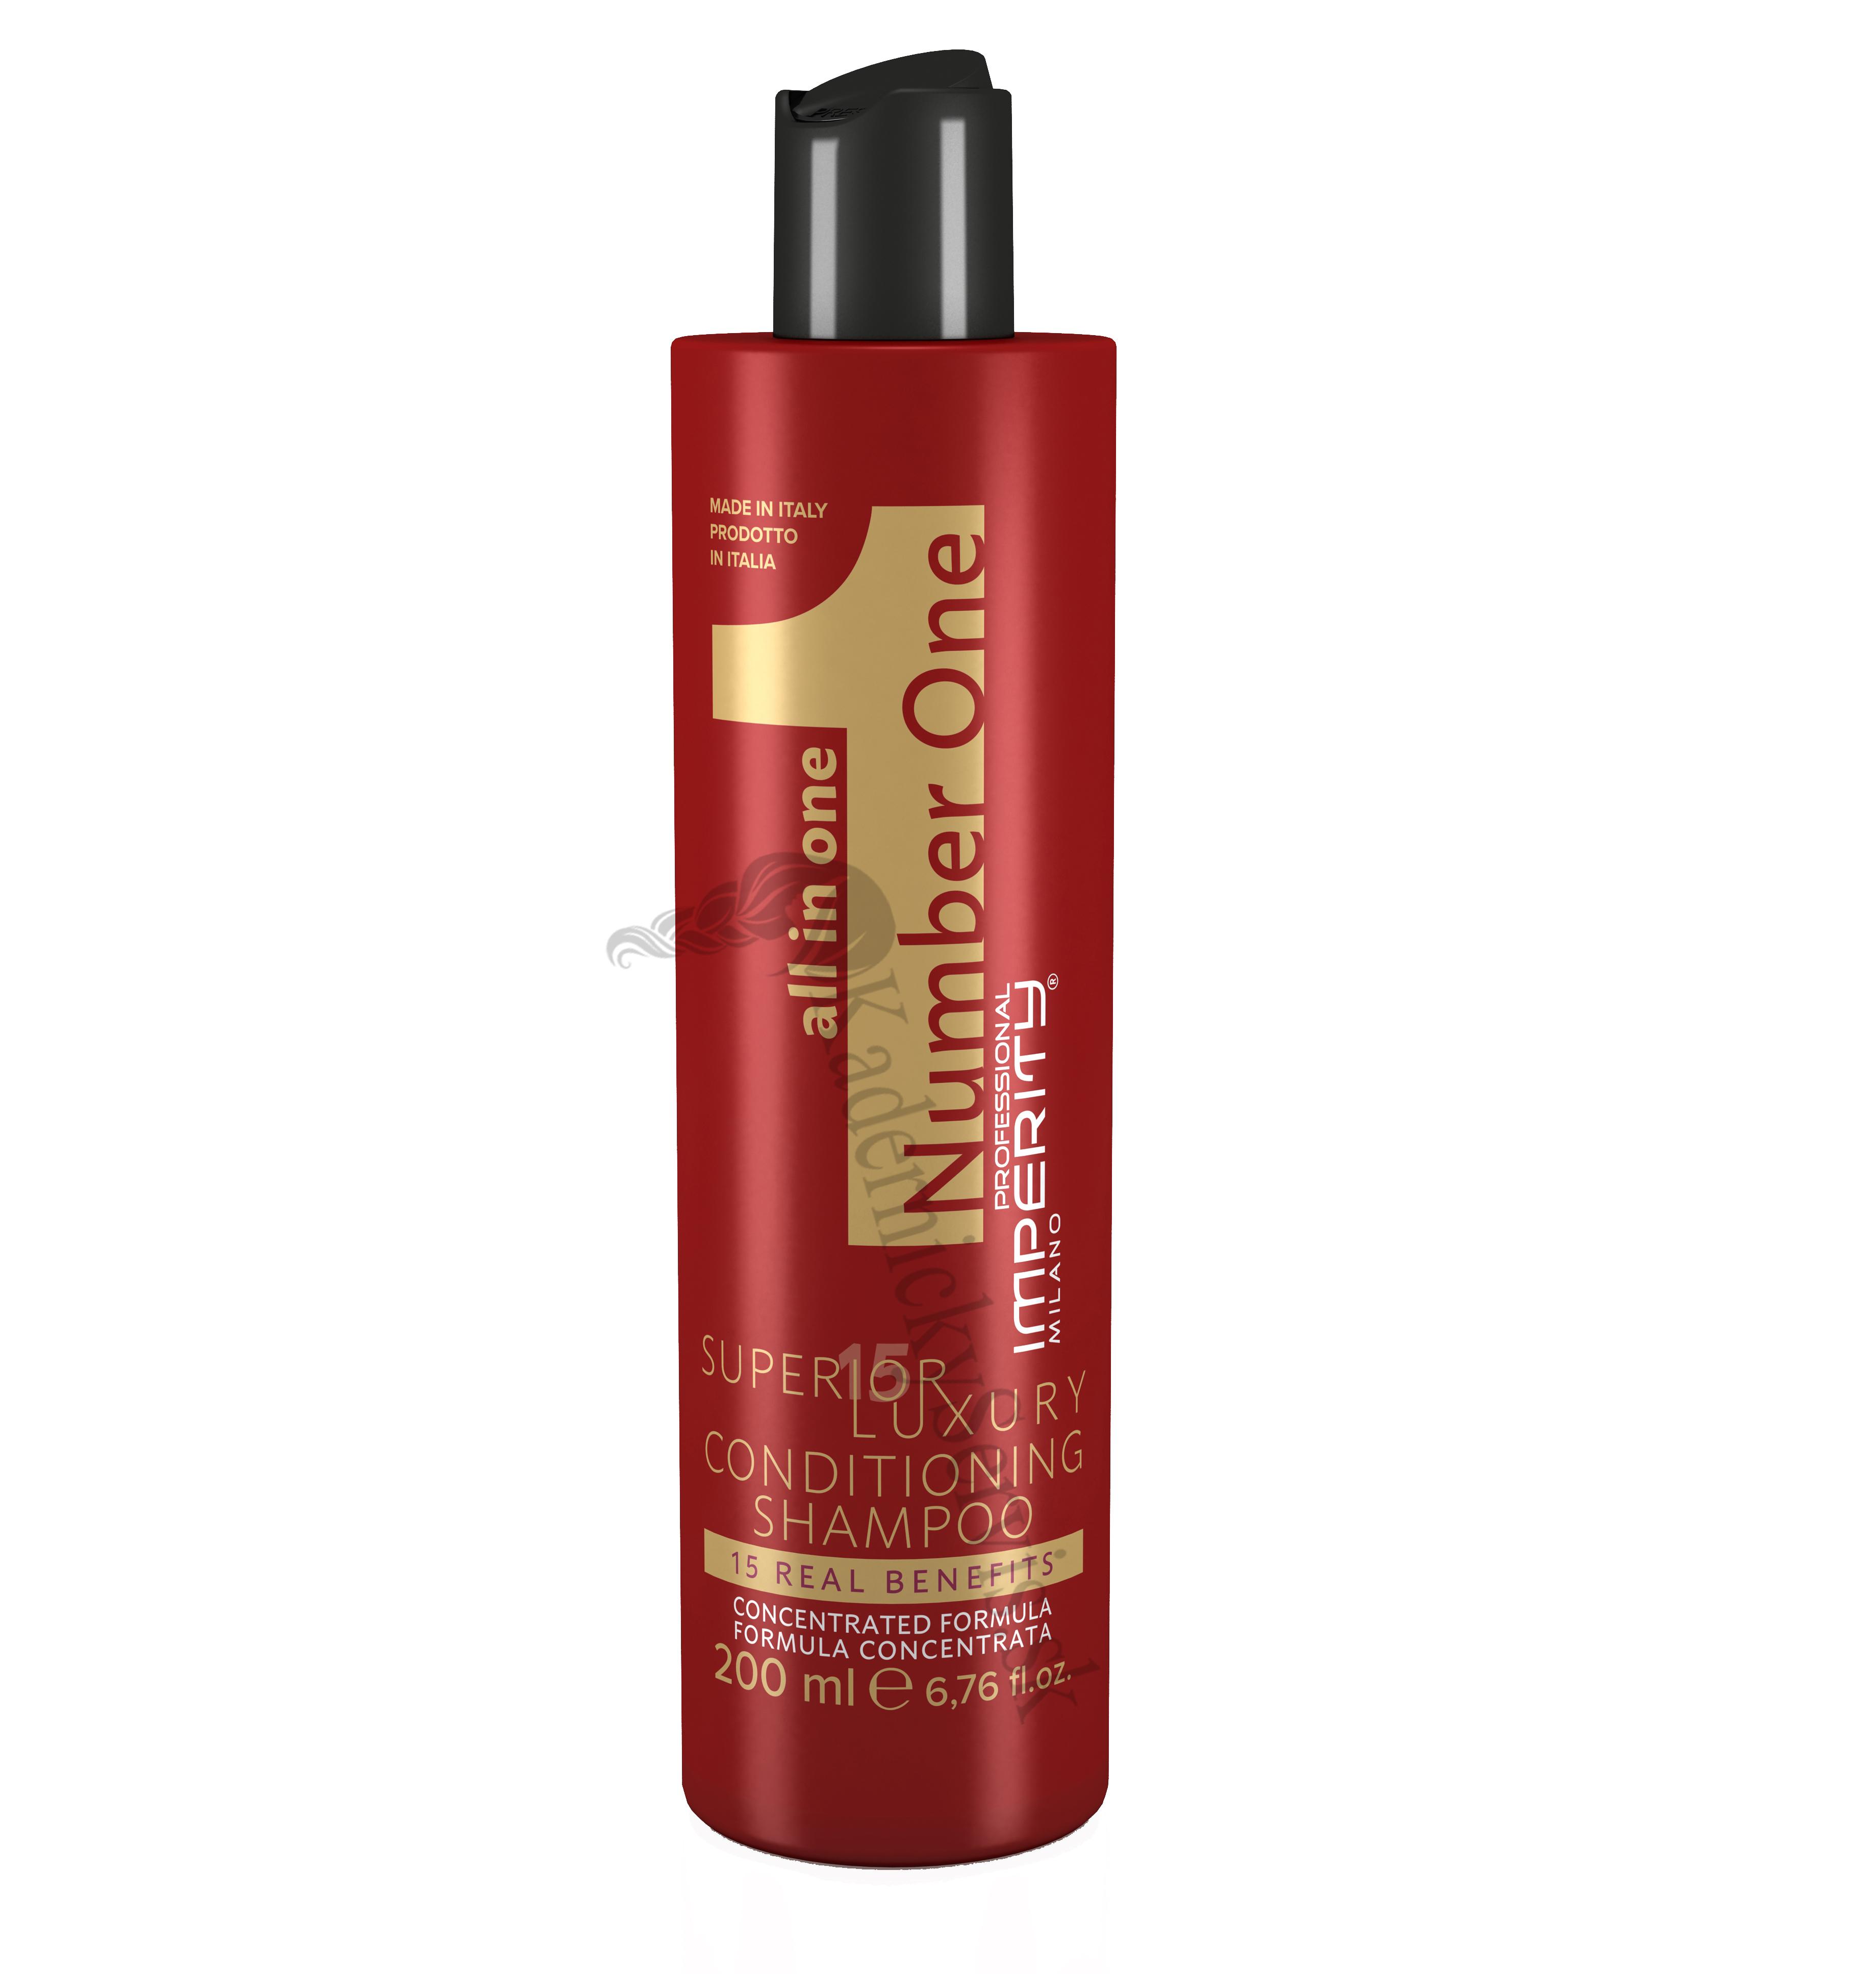 Imperity Number One Superior Luxury Conditioning Shampoo - šampón a kondicionér 2v1, 200ml